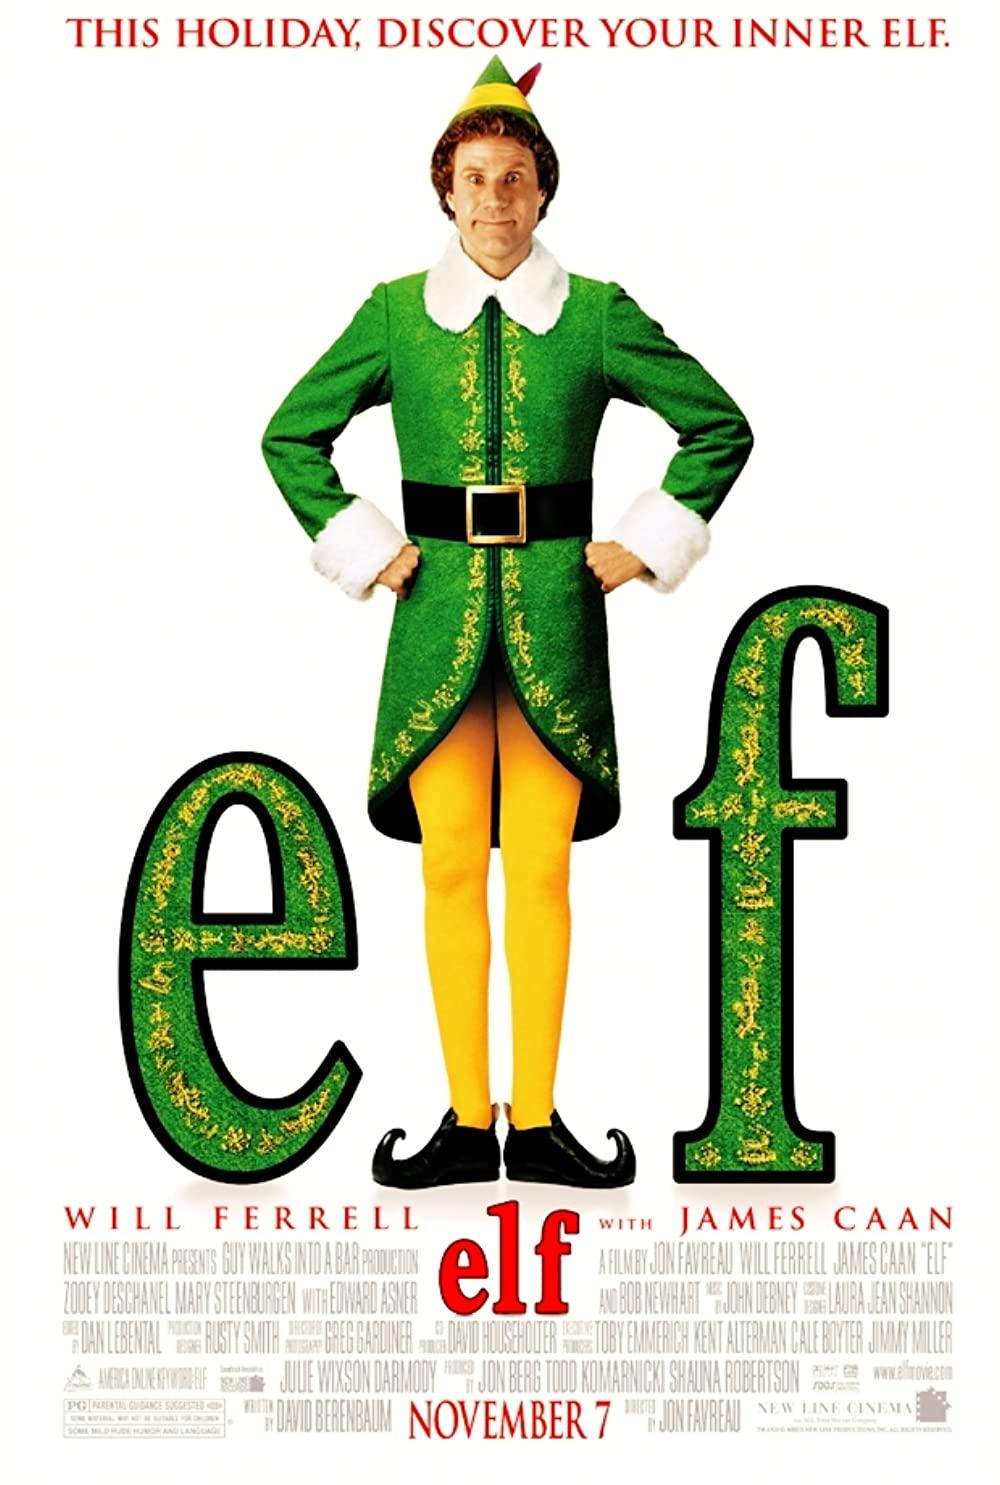 Penn Theatre Christmas Movies 2018 - elf